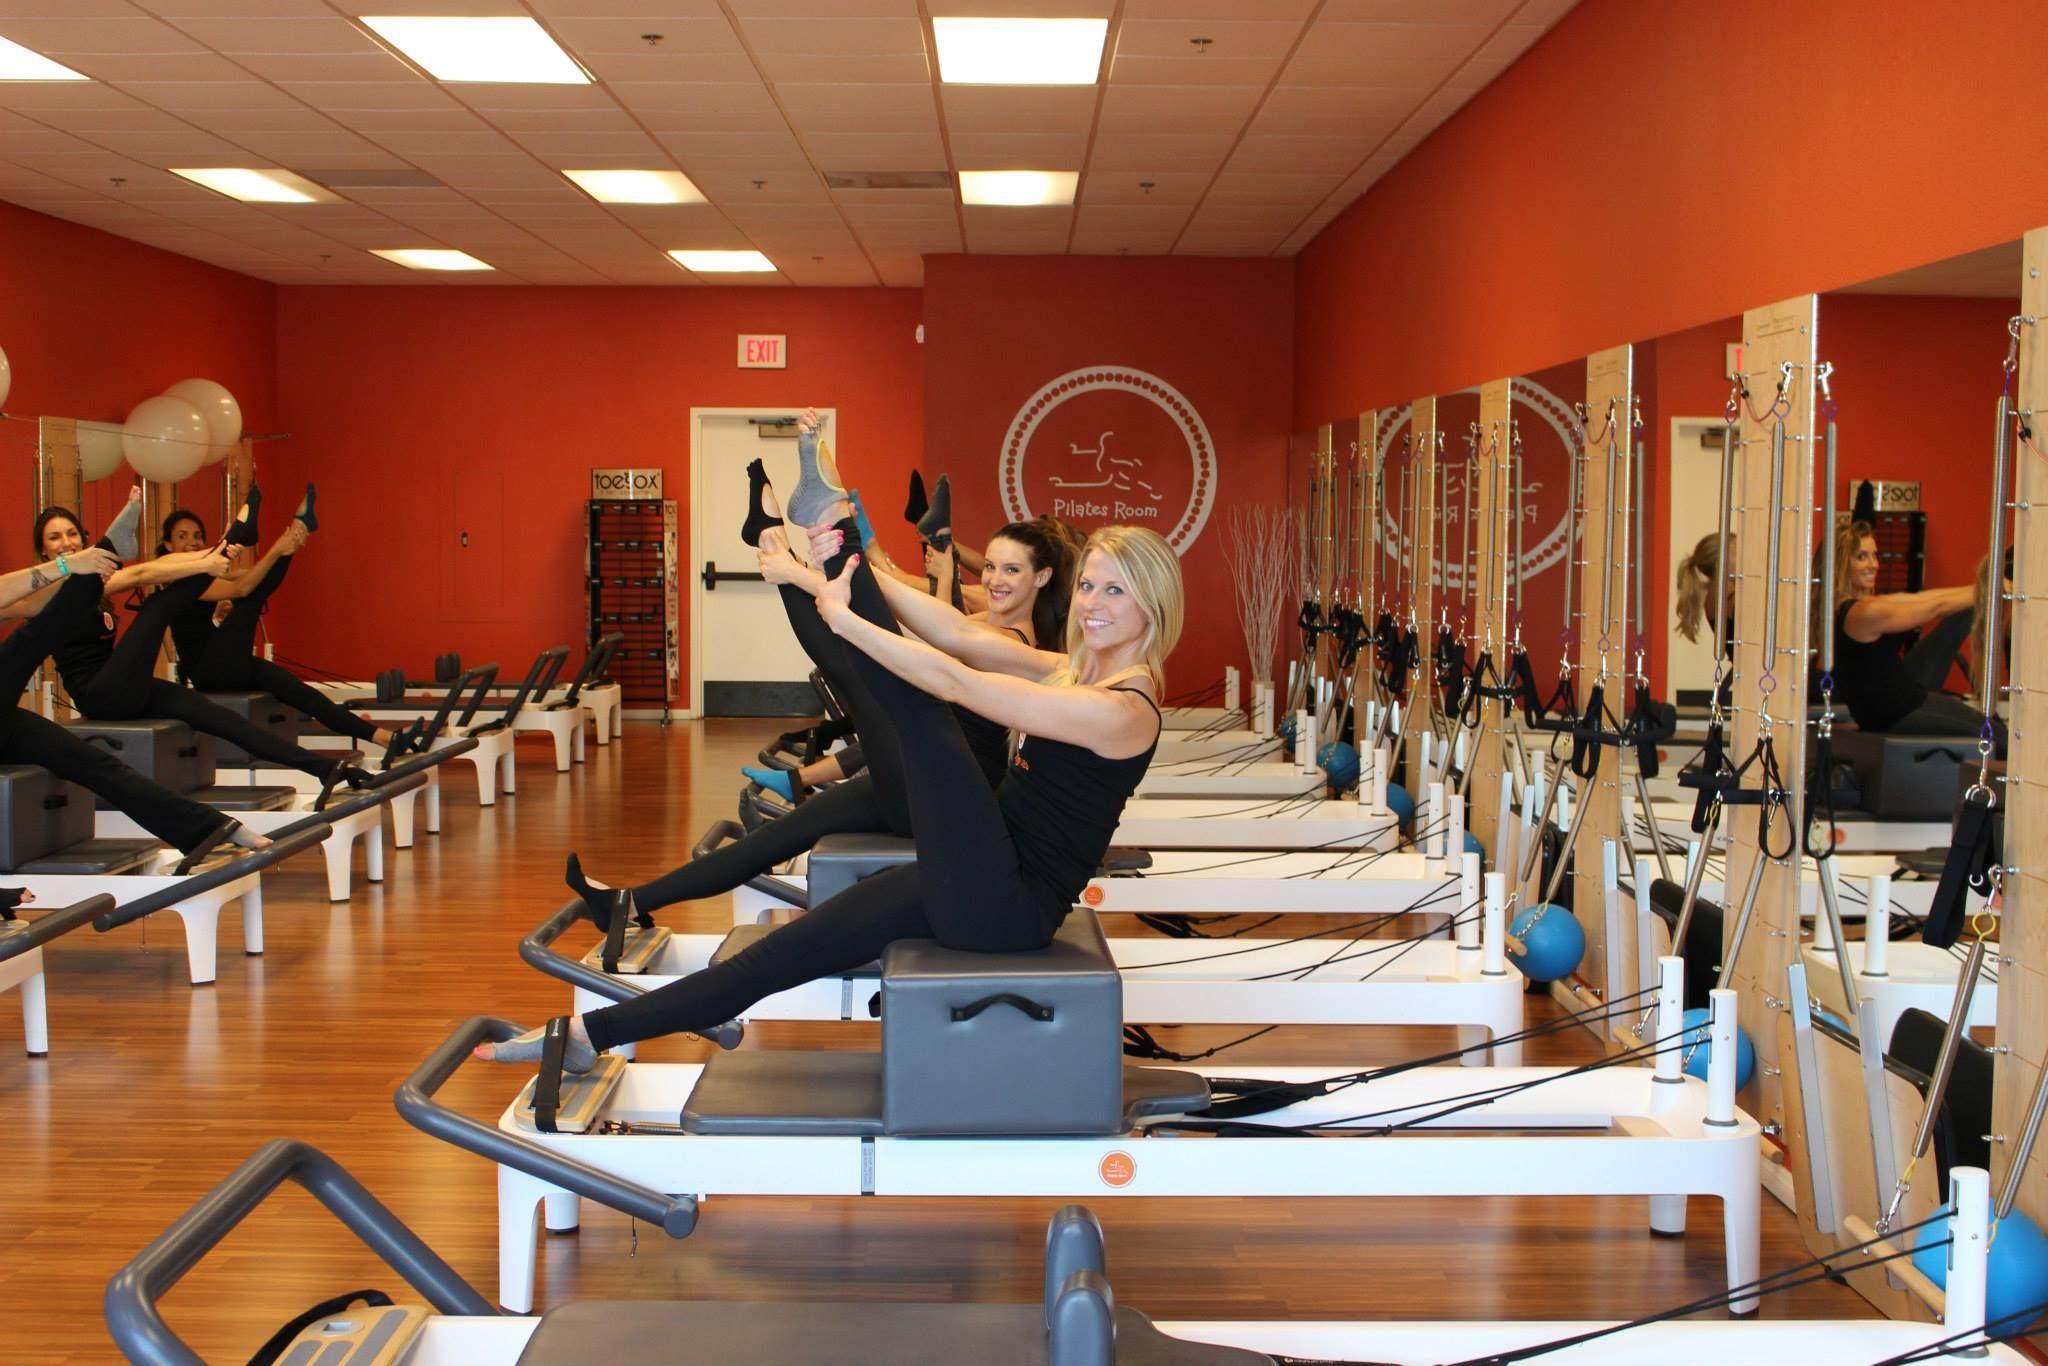 Beautiful Pilates Room Mission Valley Gallery - Ancientandautomata ...